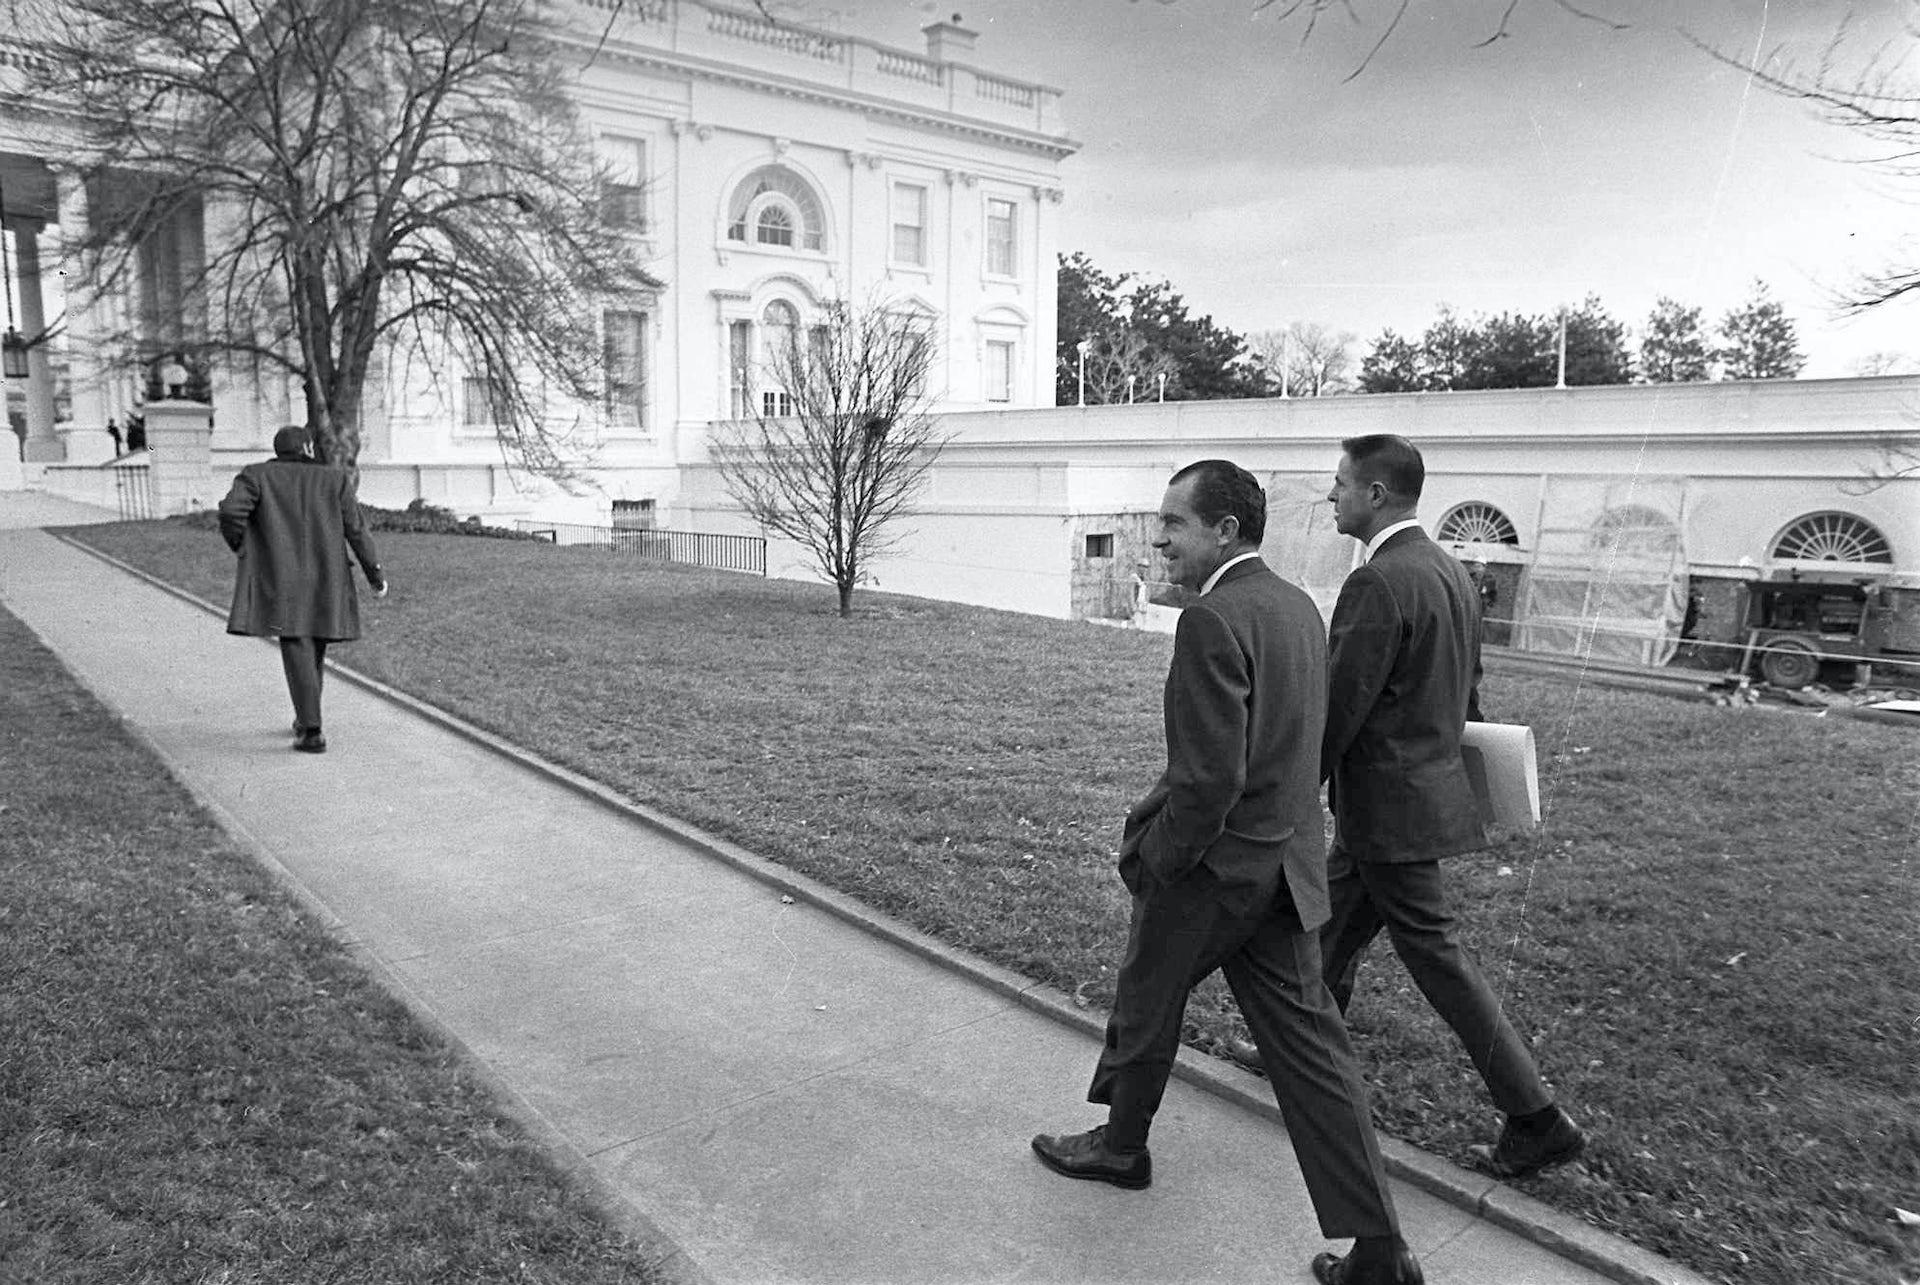 Nixon and Haldeman at the White House, 1969. AP Photo/File